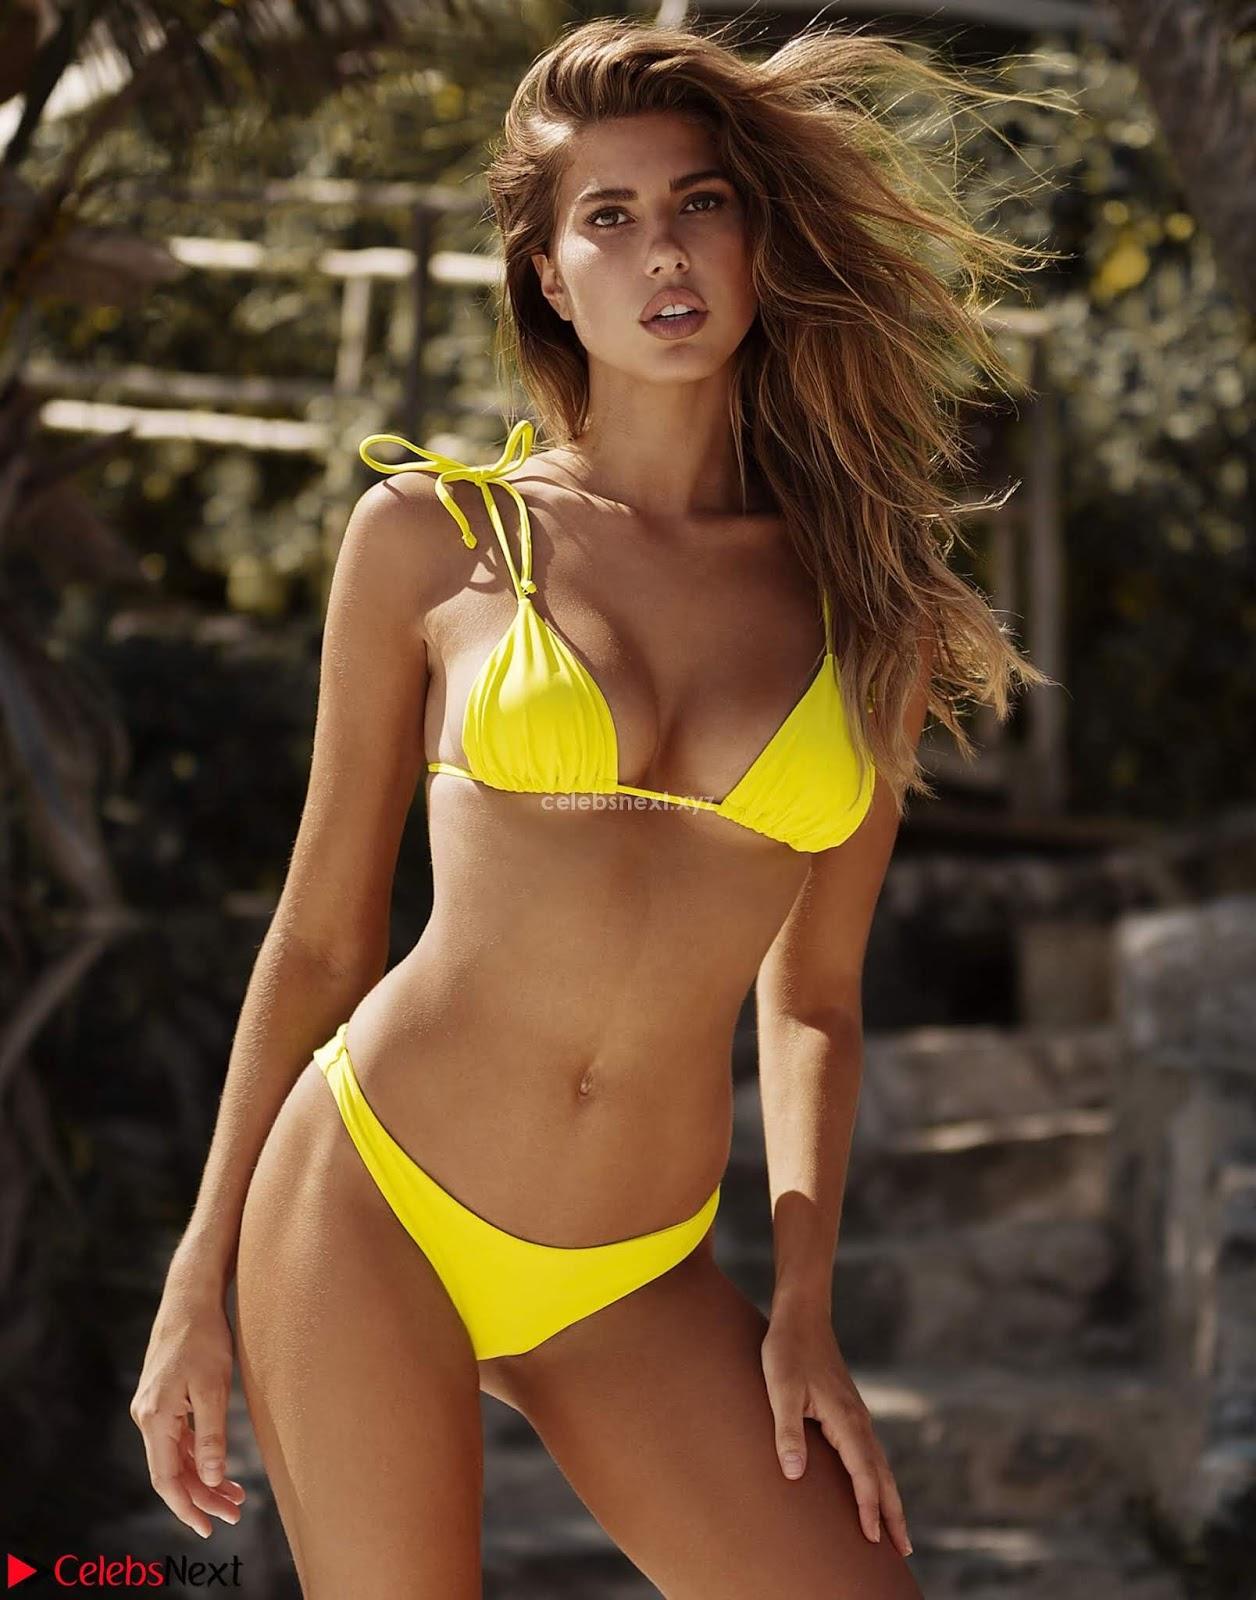 Kara Del Toro - Sexy Instagram Bikini Model with lovely ass booty super sexy tits boobs wow